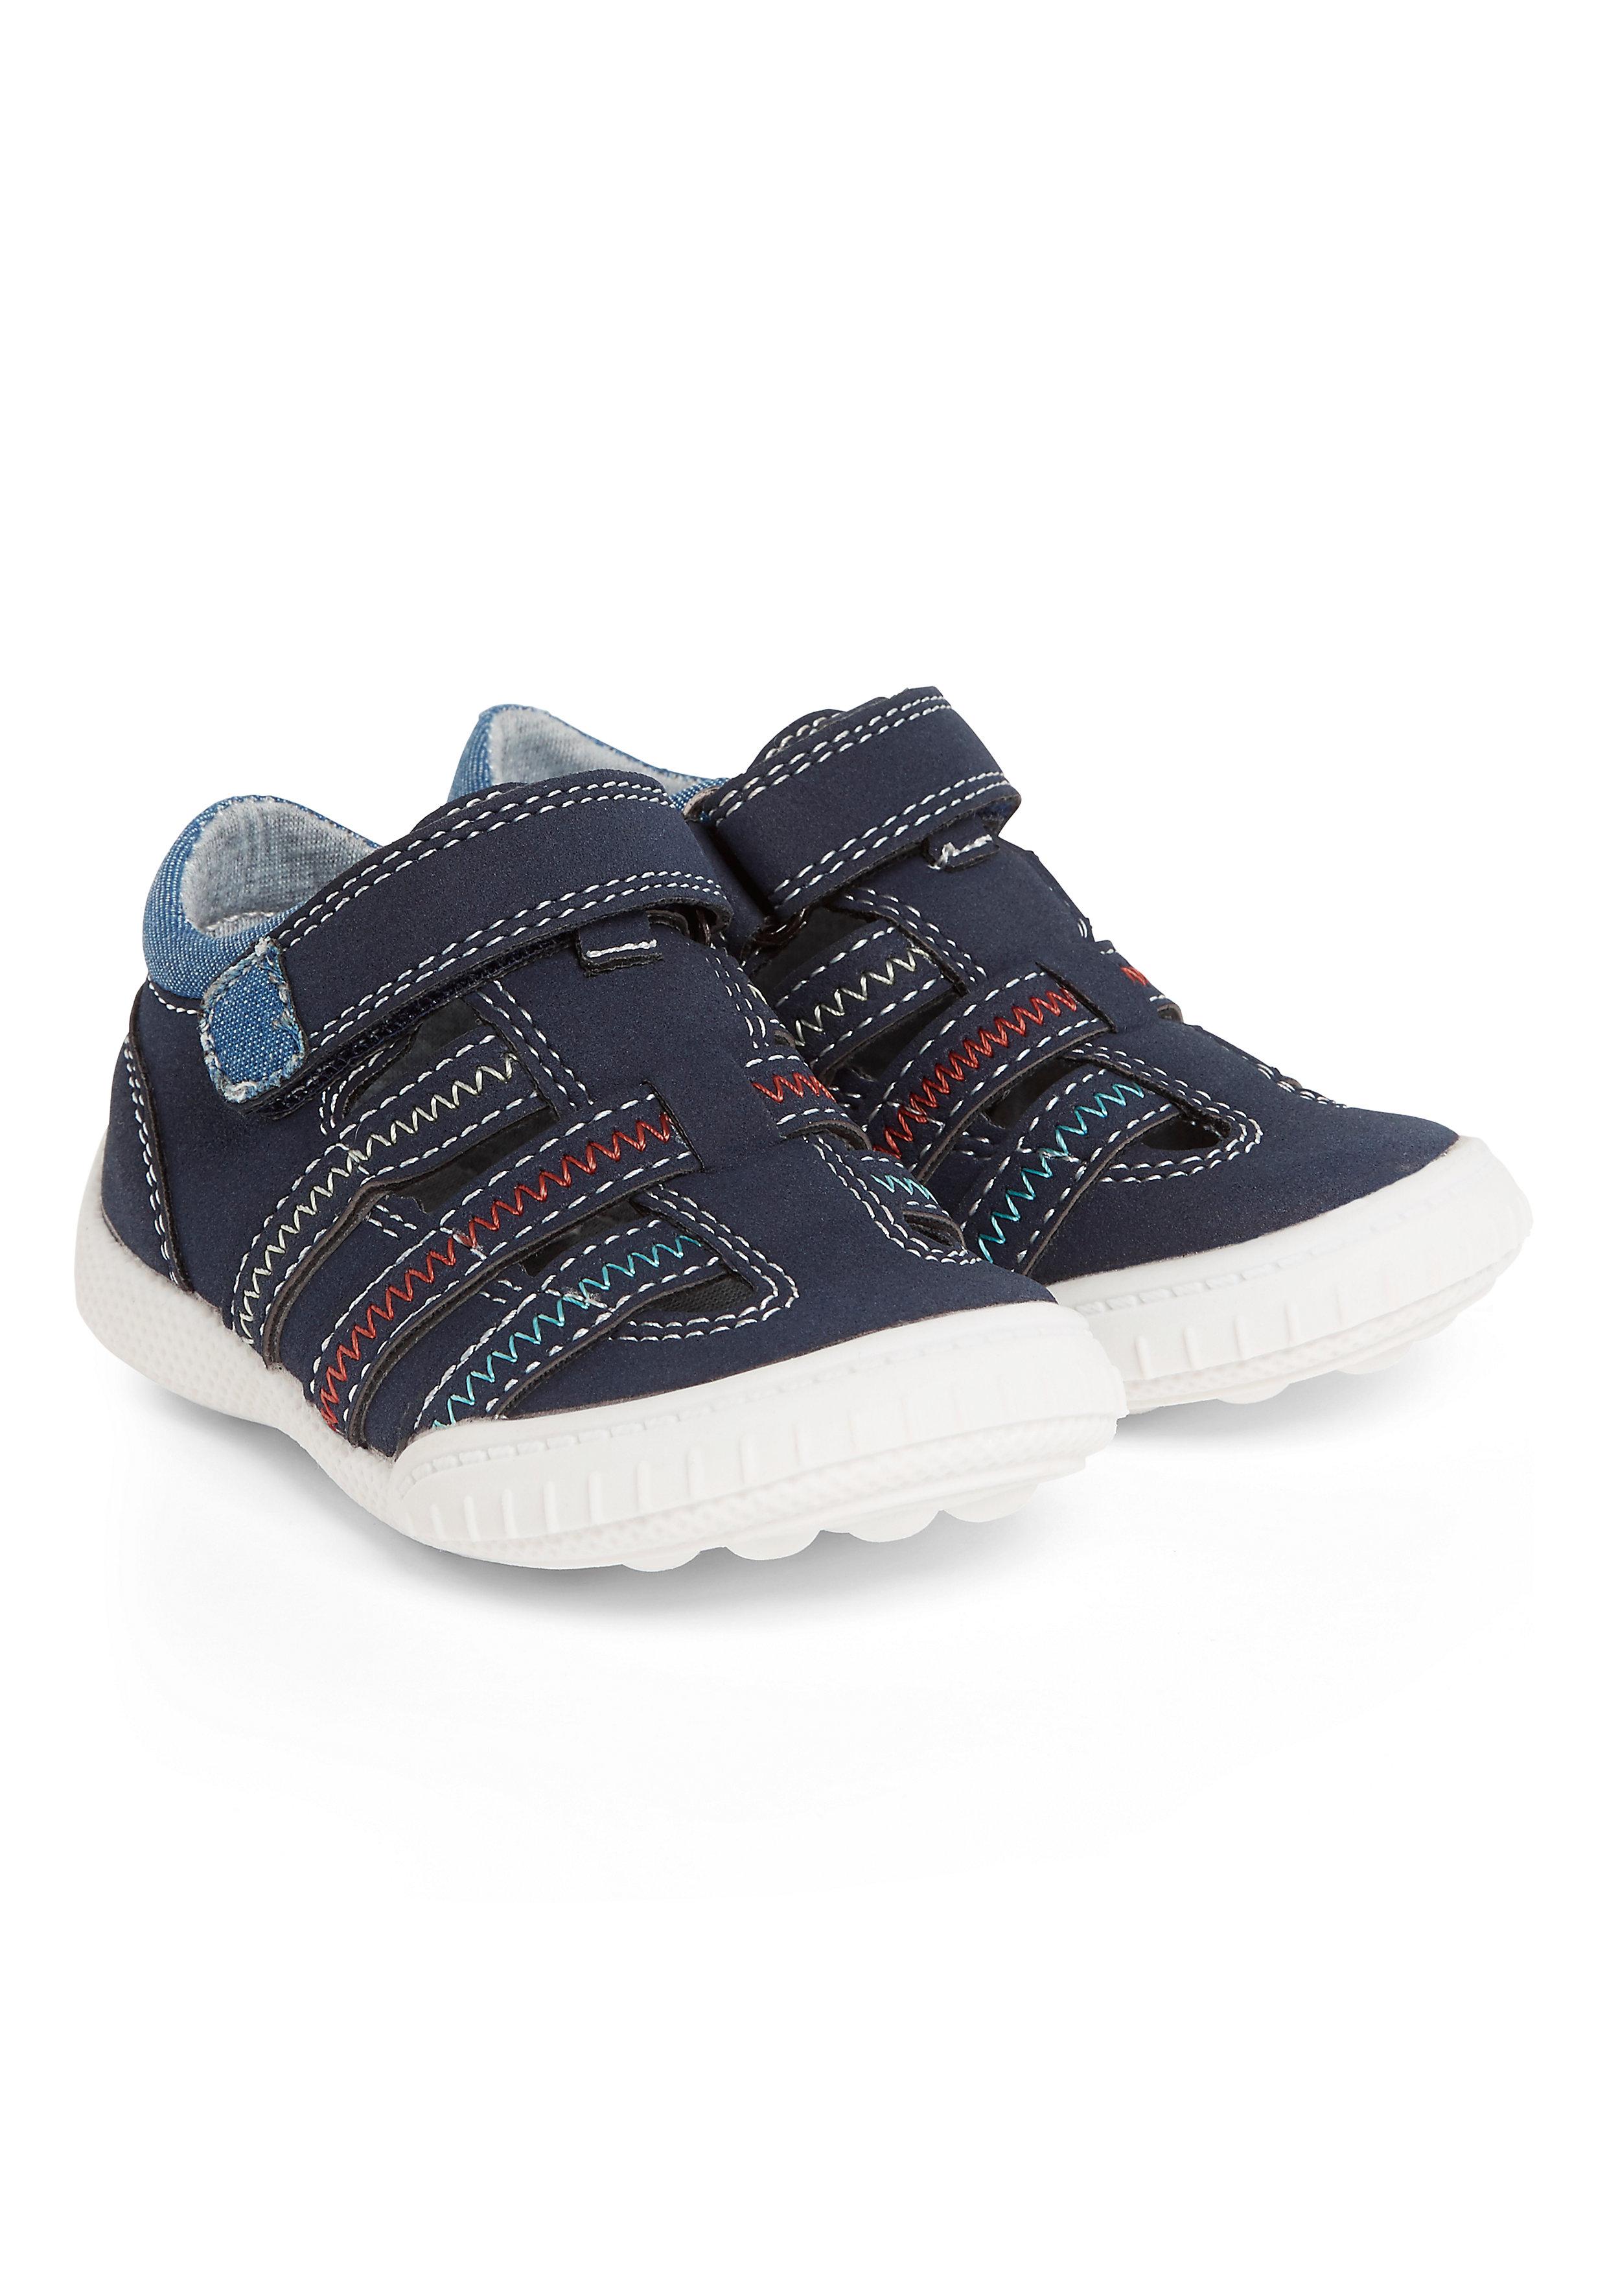 Mothercare   Boys First Walker Sandals - Navy